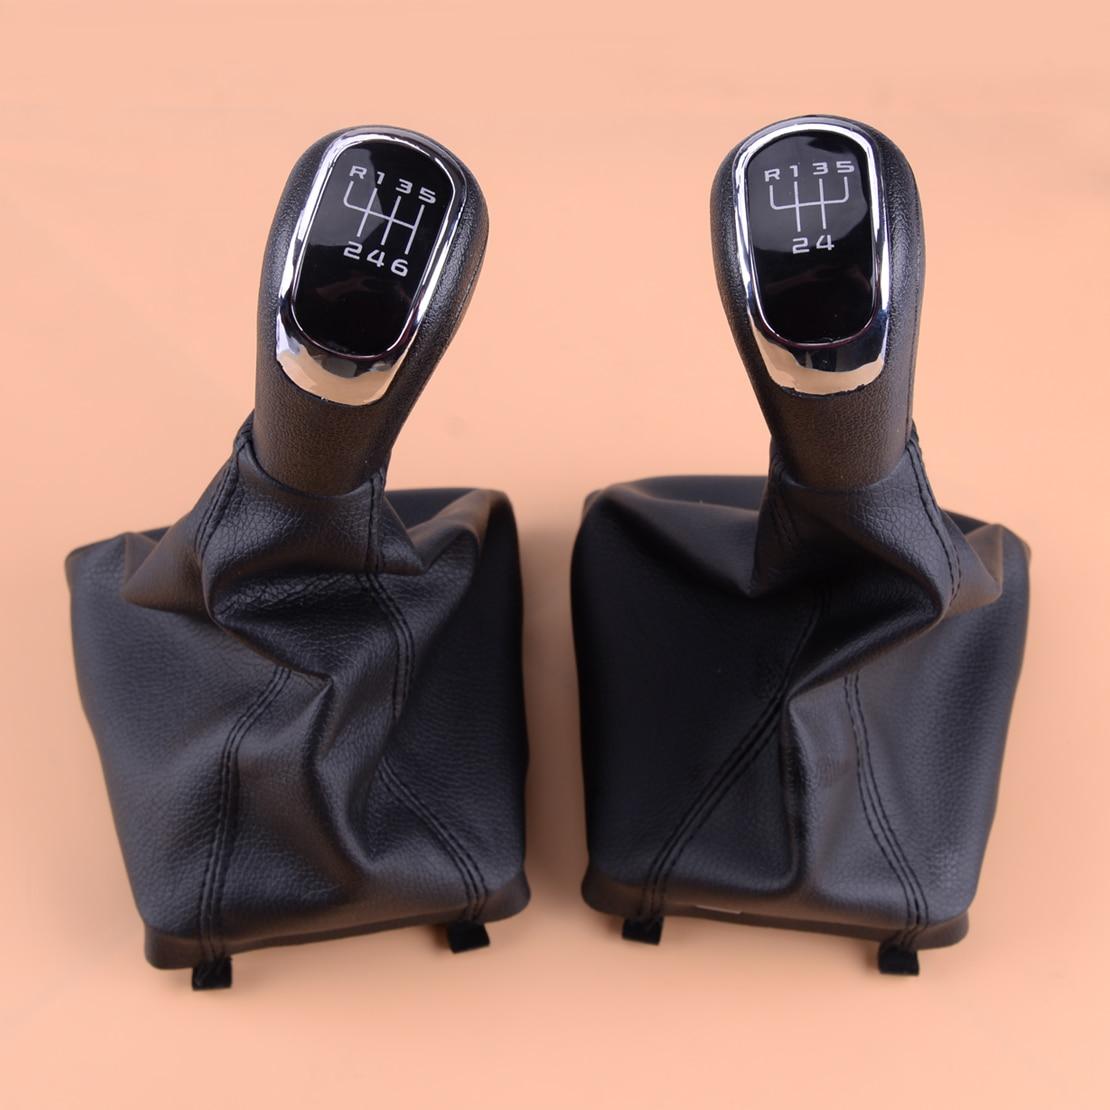 Nueva palanca de cambio de marchas negra 5 6 velocidades perilla de cambio ESTRUCTURA DE polaina palanca coche 1Z0711141 ajuste para Skoda Superb 2008 2009 2010 2011 2012